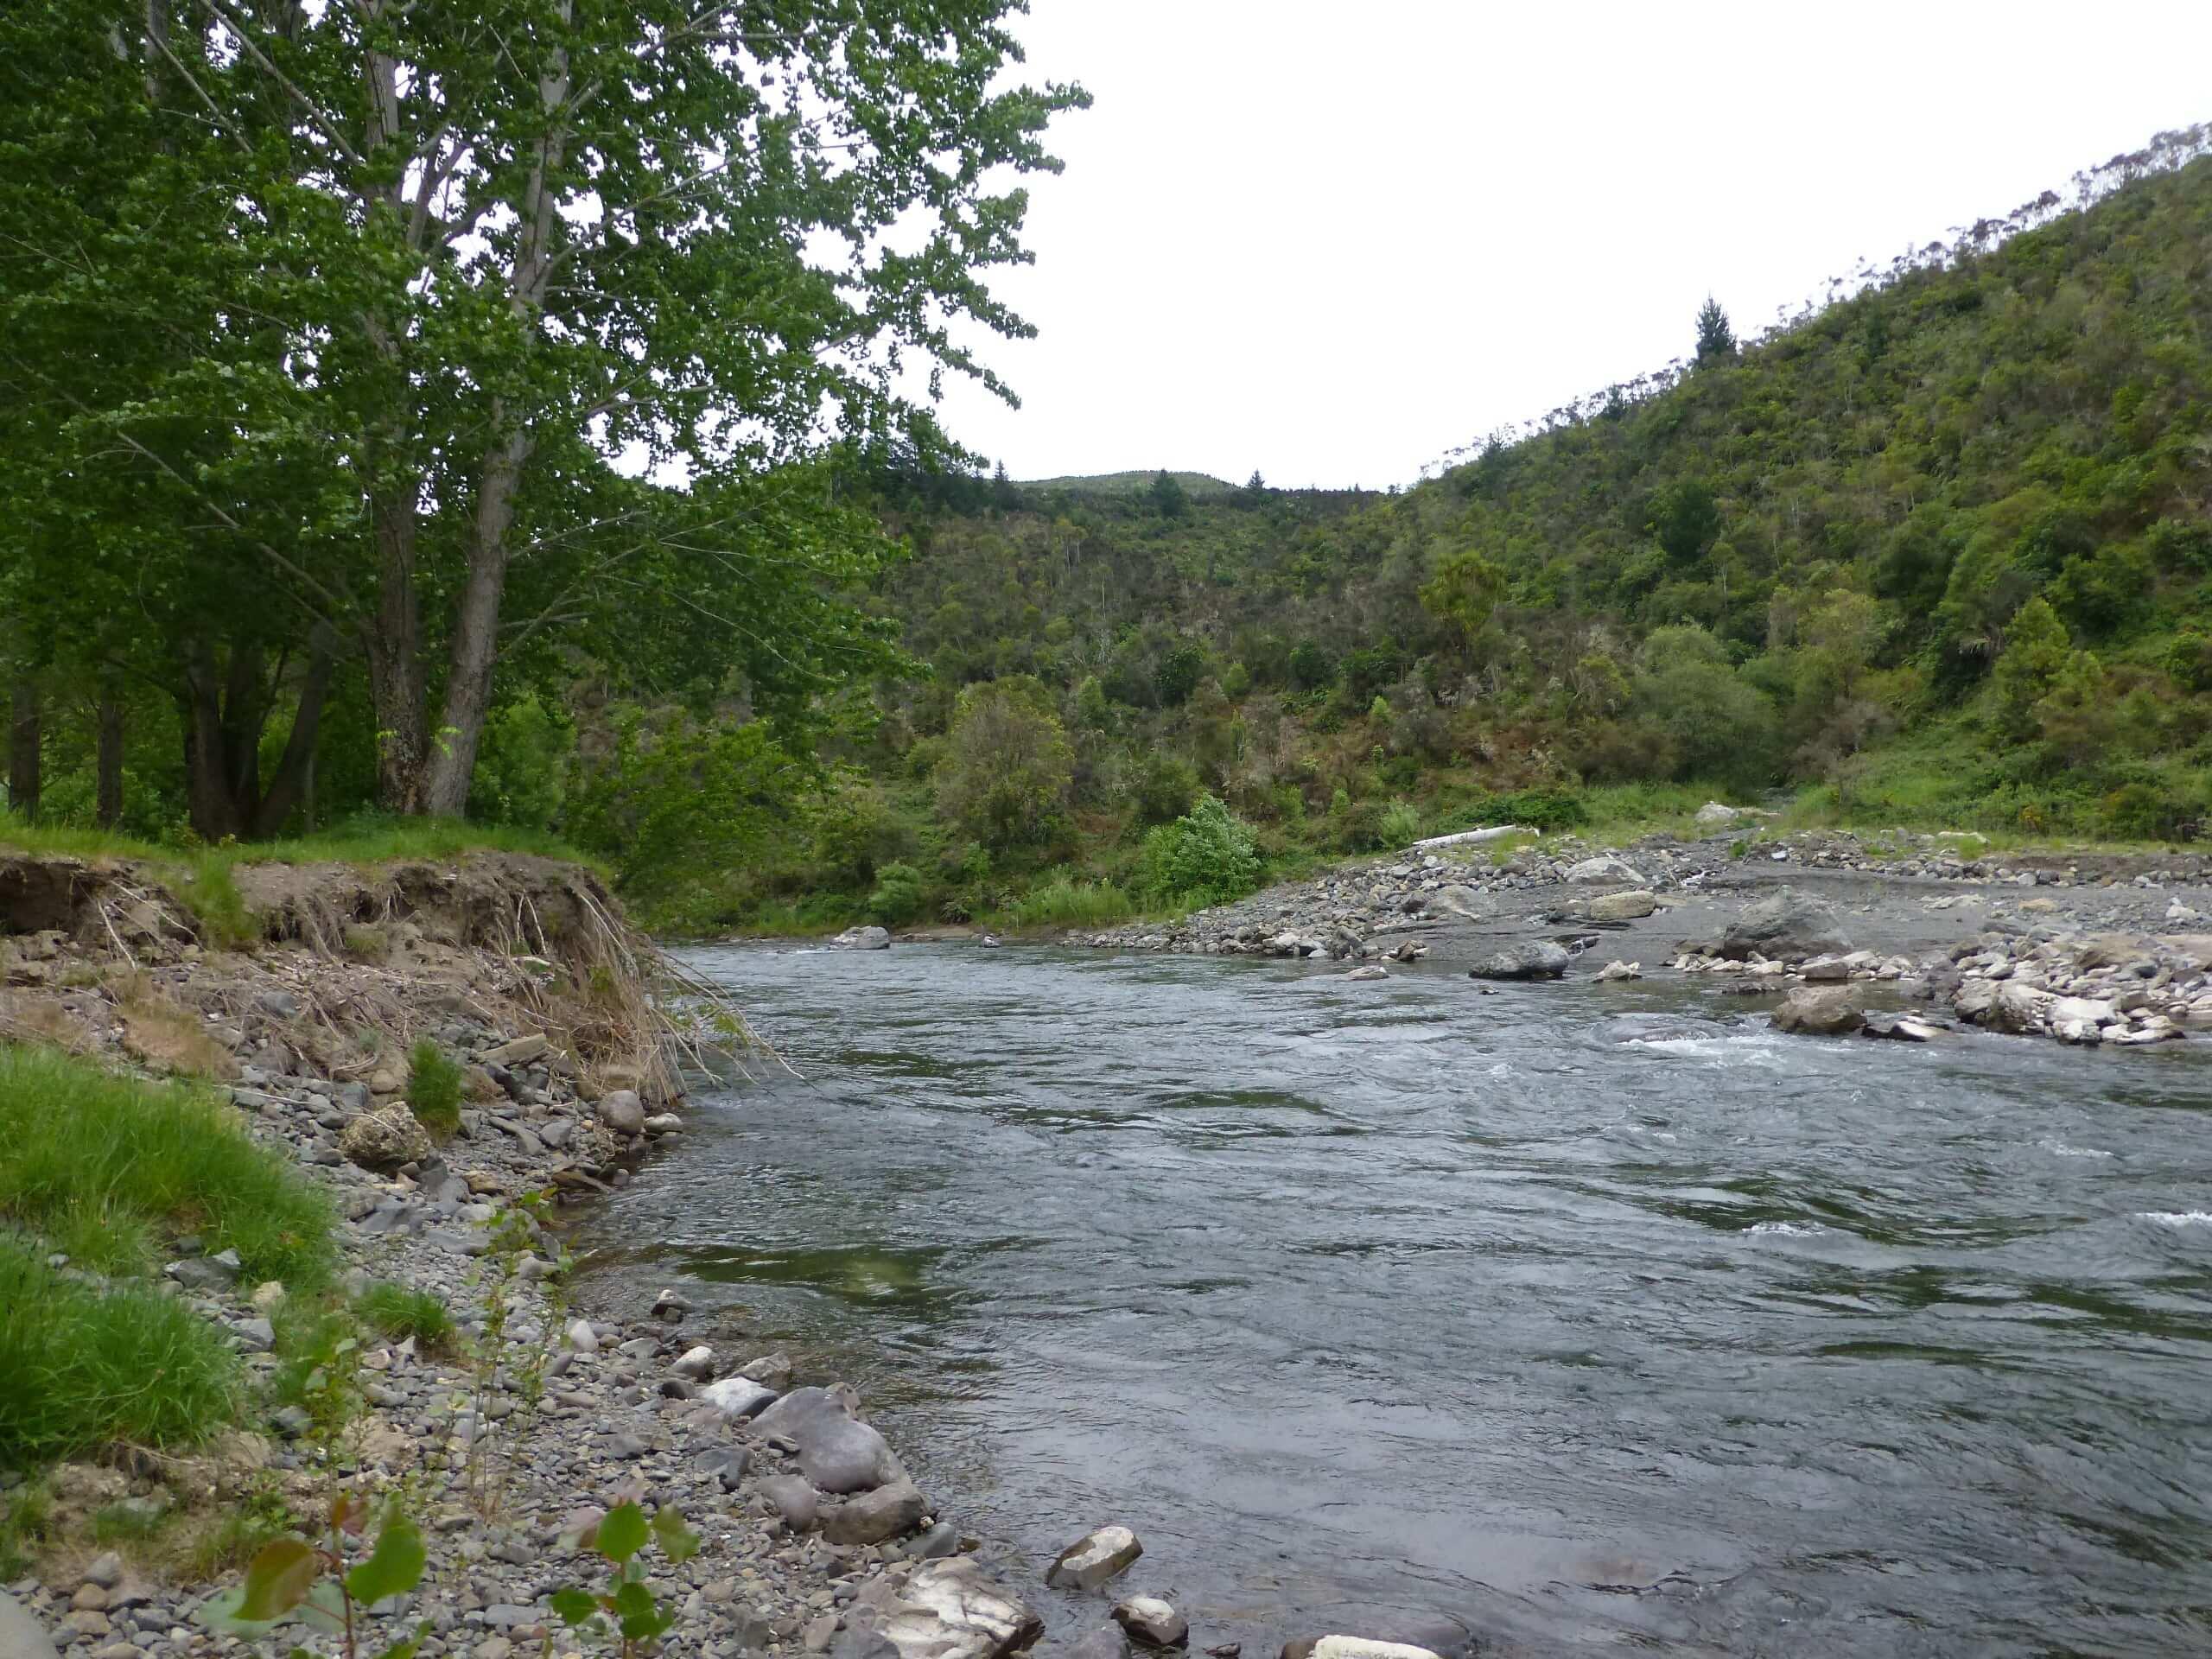 Weit weg Reisen, Mōhaka River, Mountain Valley Adventures Lodge 1